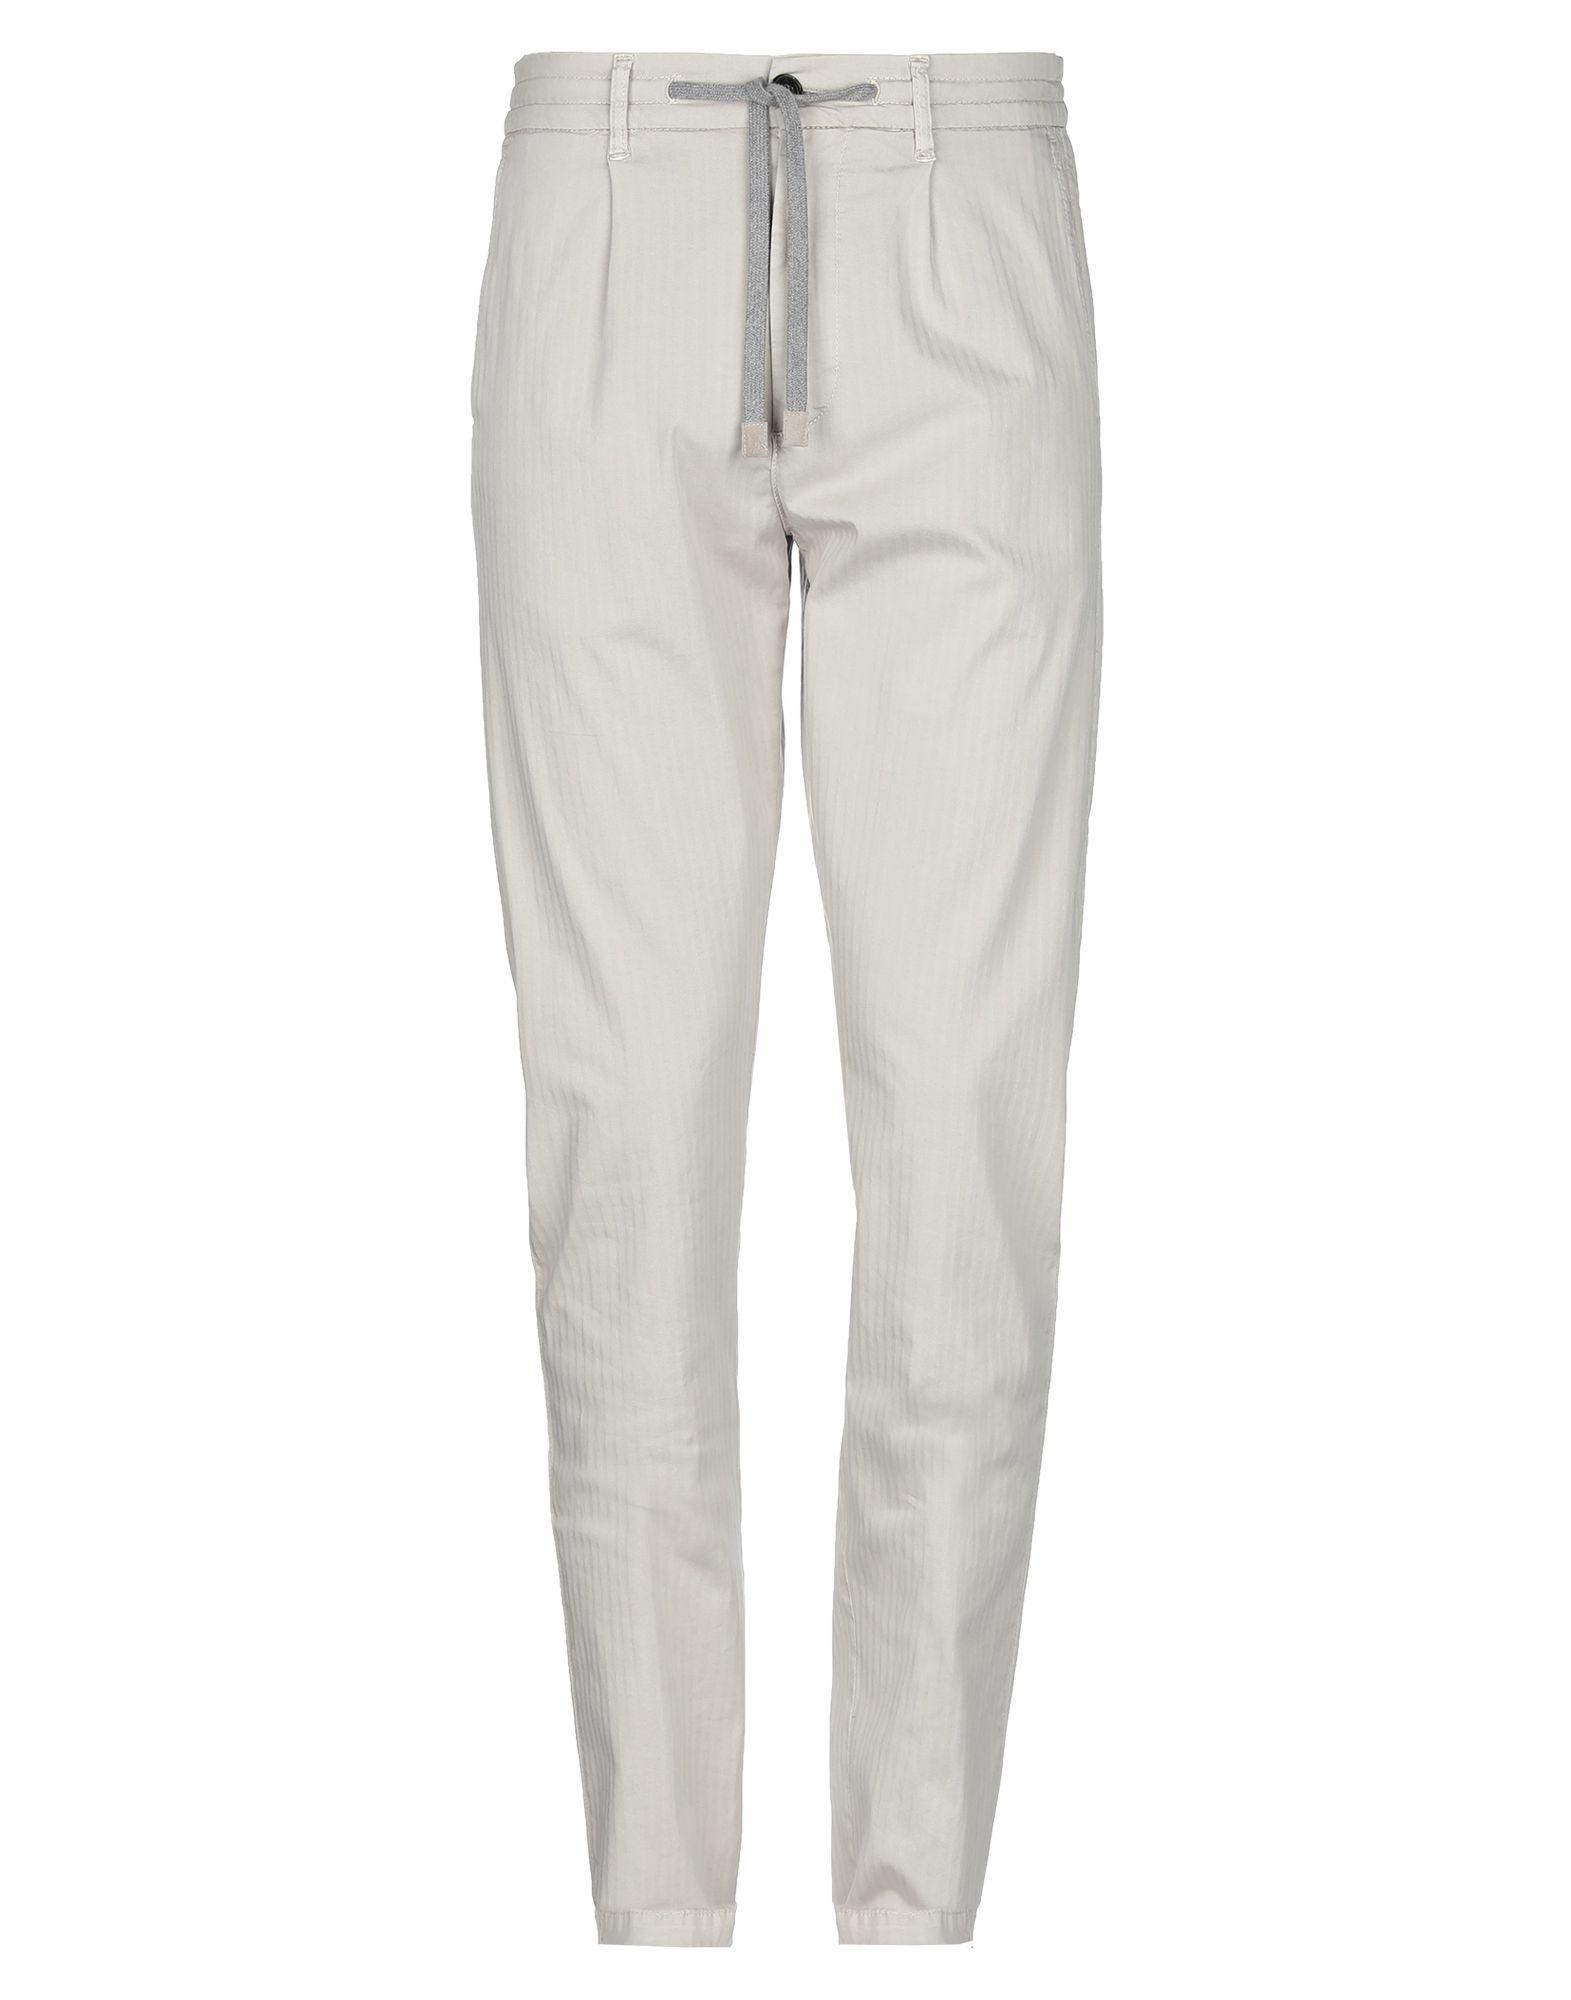 ELEVENTY Casual pants. plain weave, laces, herringbone, mid rise, regular fit, straight leg, button, zip, multipockets, stretch. 98% Cotton, 2% Elastane